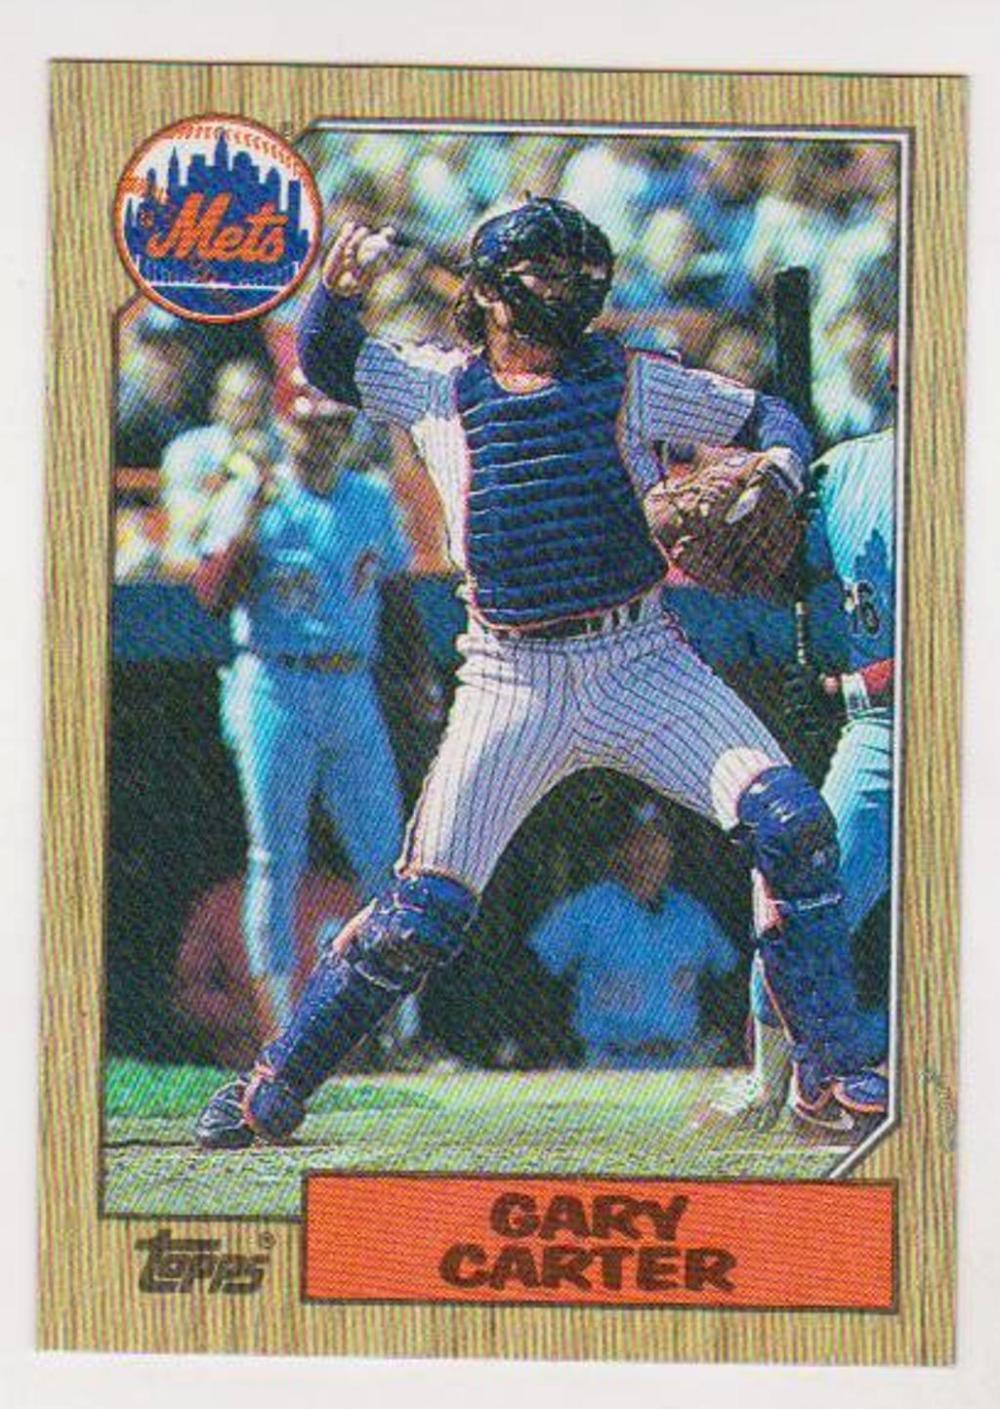 Error 1987 Topps Gary Carter Wrong Back Error Card